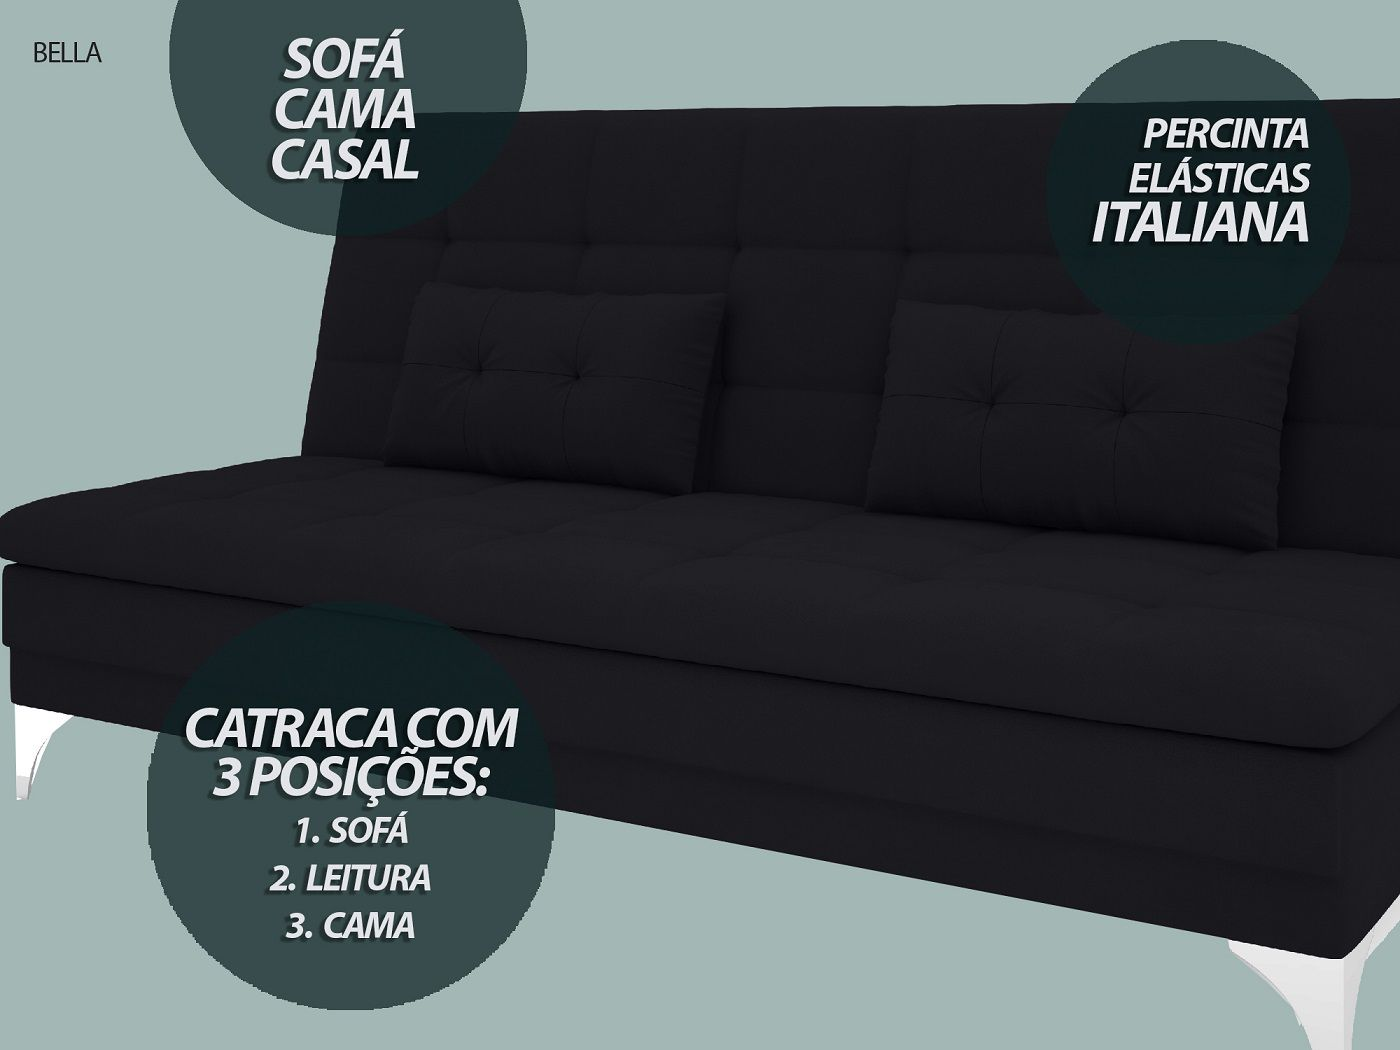 Sofá-Cama Casal New Bella 1,87m Velosuede Preto - NETSOFAS